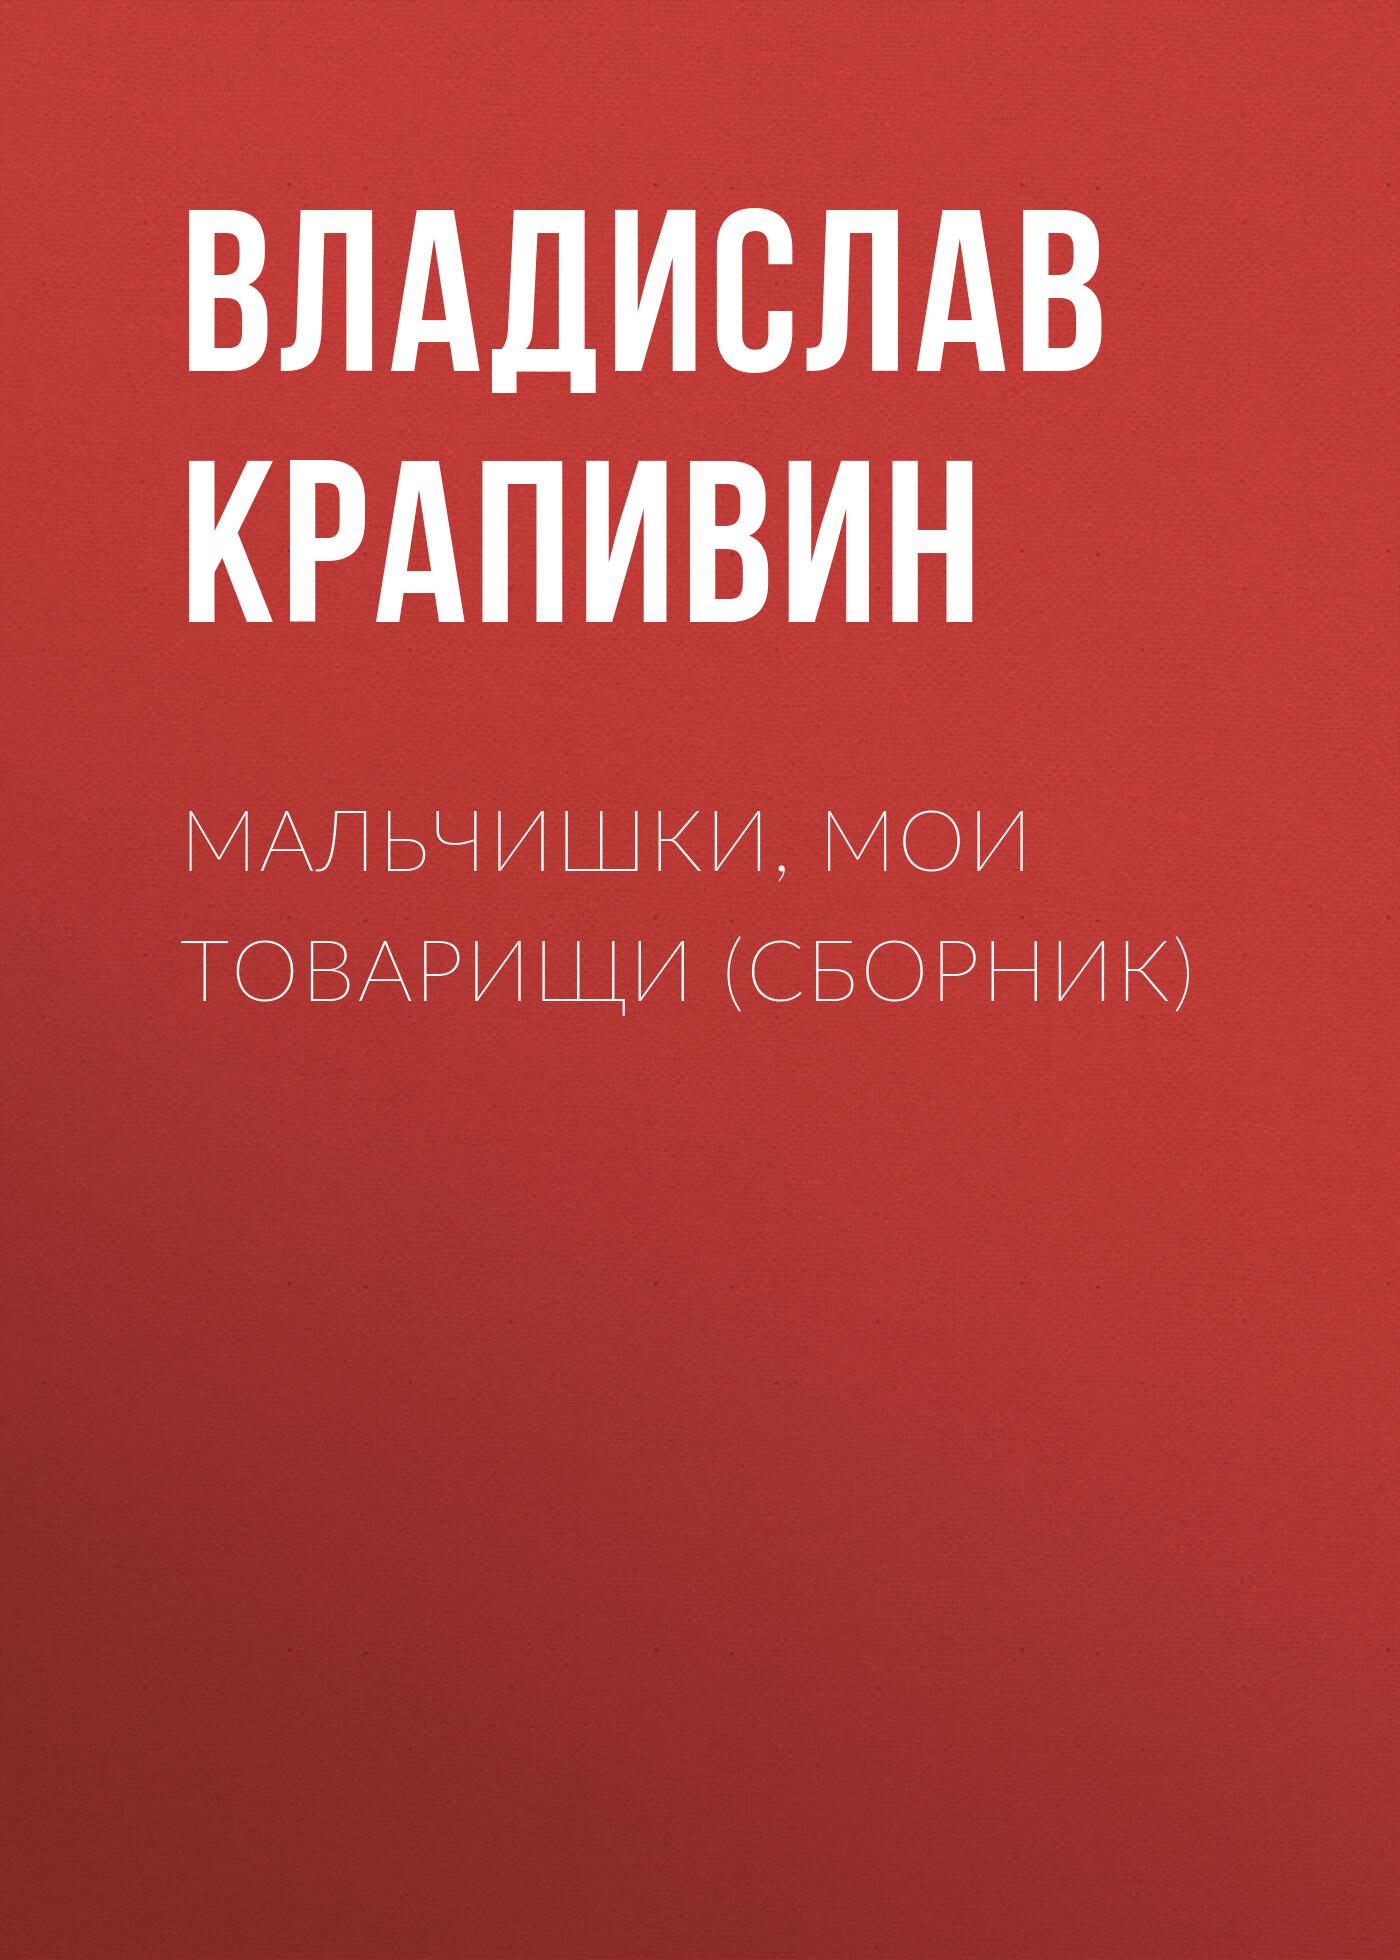 цена Владислав Крапивин Мальчишки, мои товарищи (сборник)